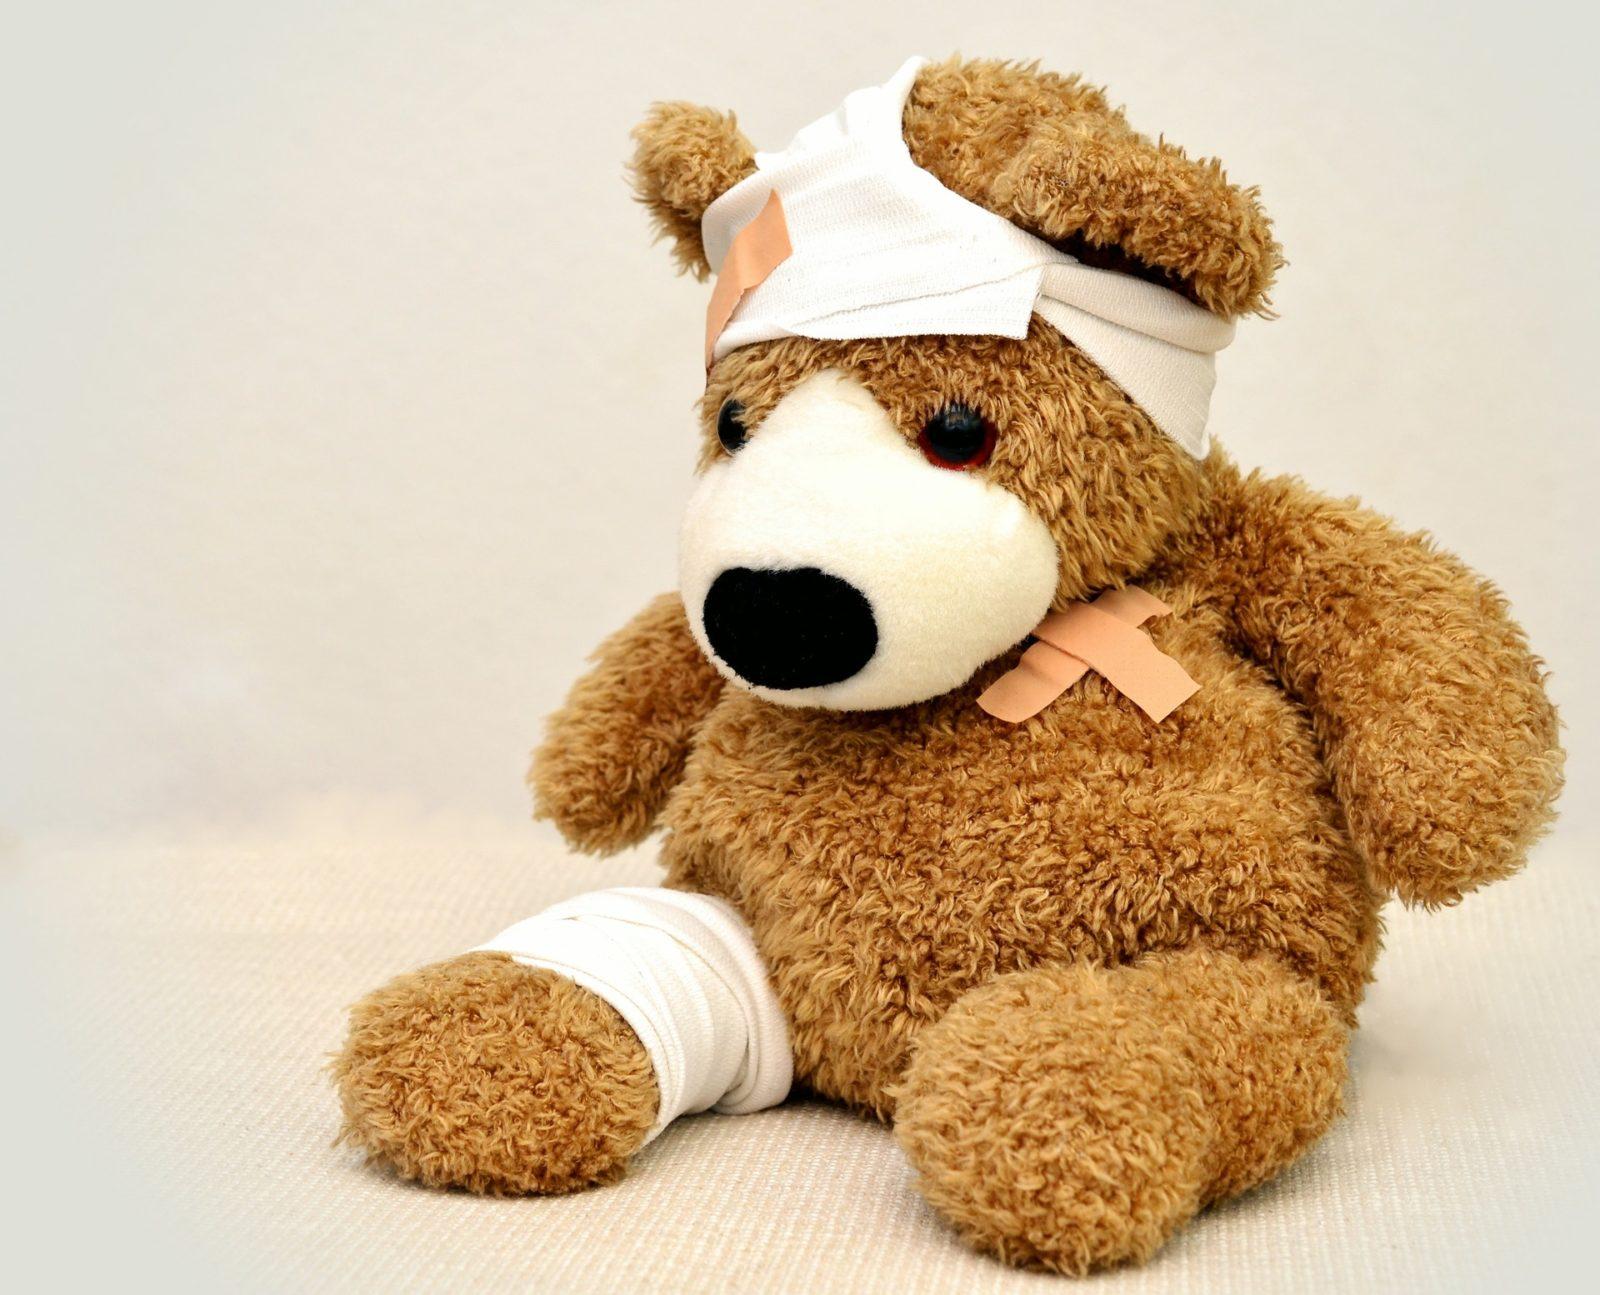 urso de pelúcia todo cheio de curativos